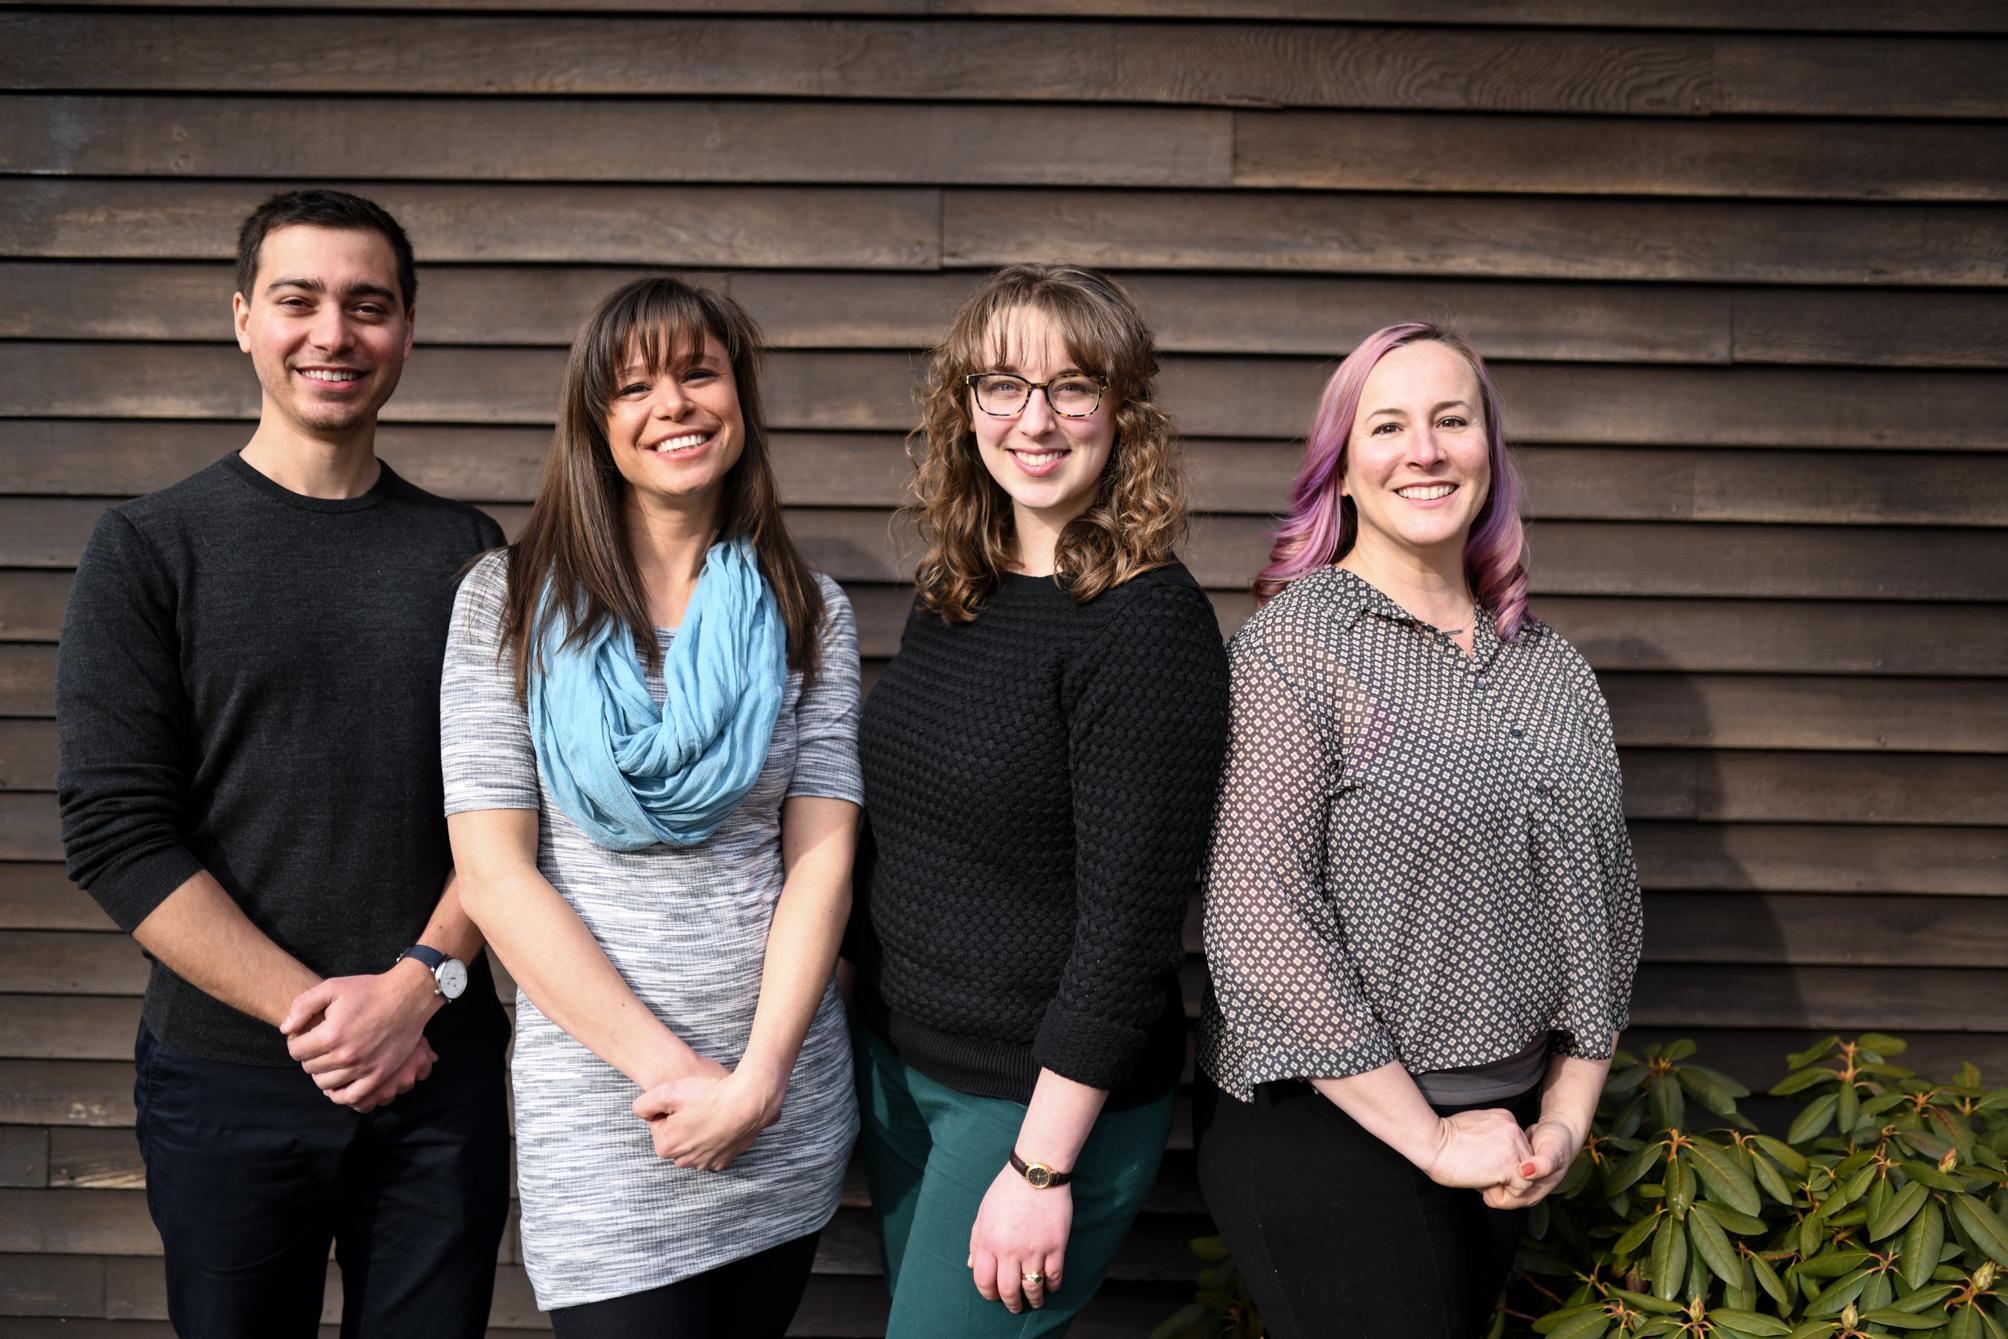 From left to right: Jordan Elias, MT-BC, Marissa Scott, MA, MT-BC, CLD, Rebecca Gildea, MT-BC and Serena Duckrow, PhD, ATR-BC, NDD